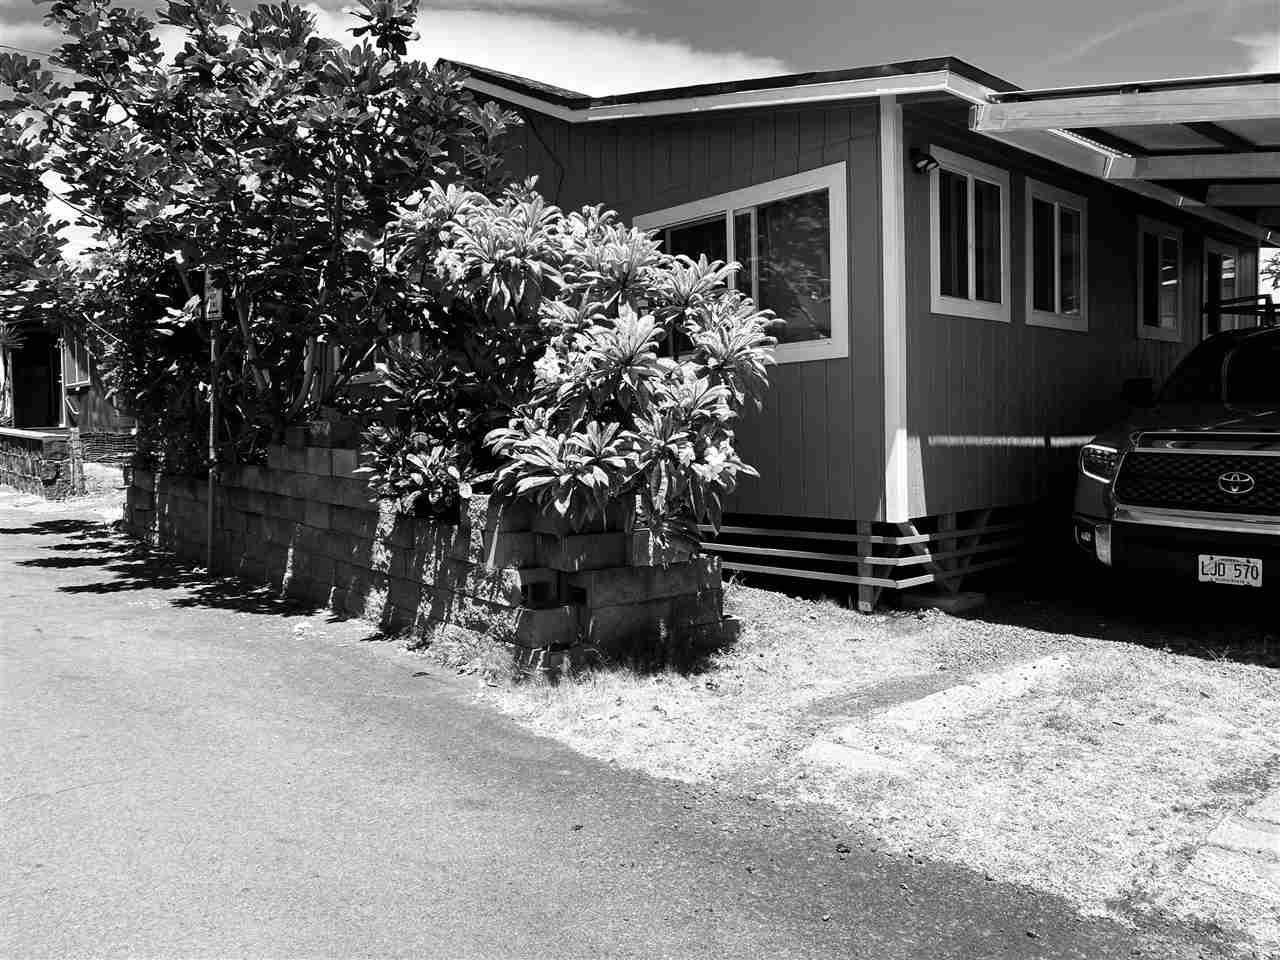 1960 North Street St, Wailuku, HI 96793 - #: 392398